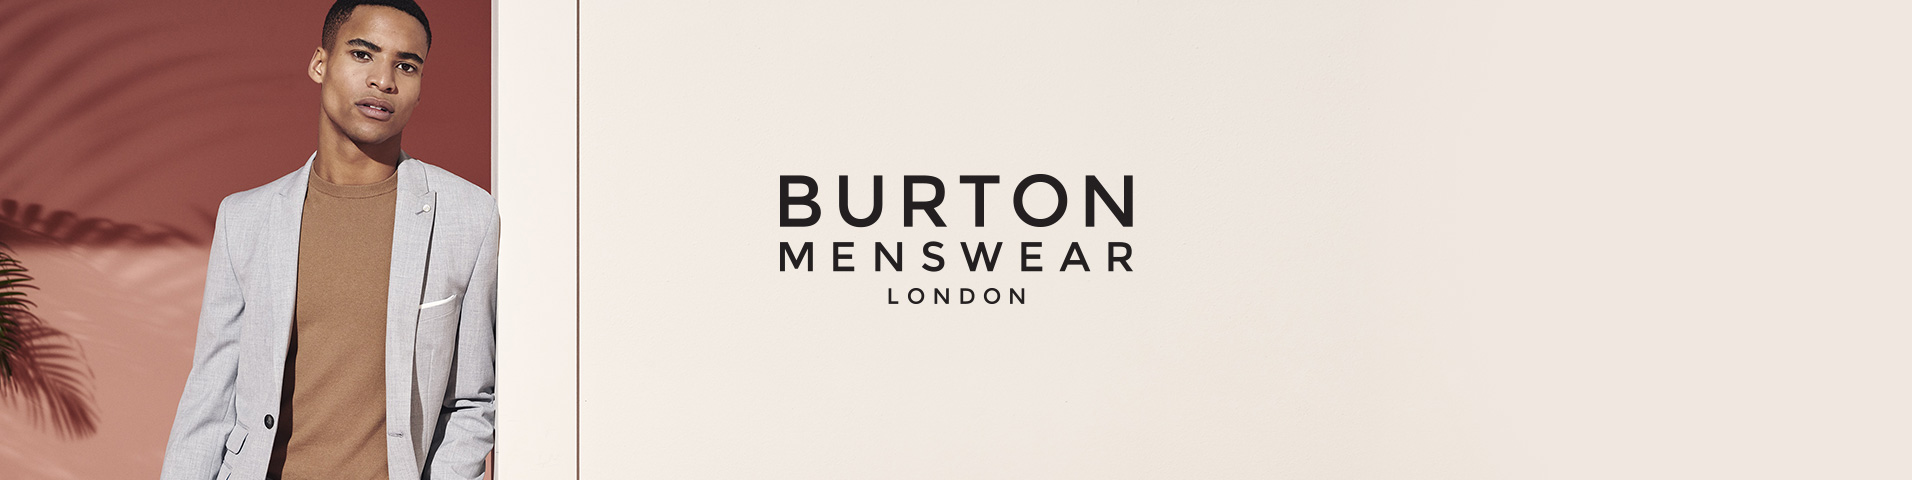 Kleding Inline.Burton Menswear London Kleding Online Kopen Gratis Verzending